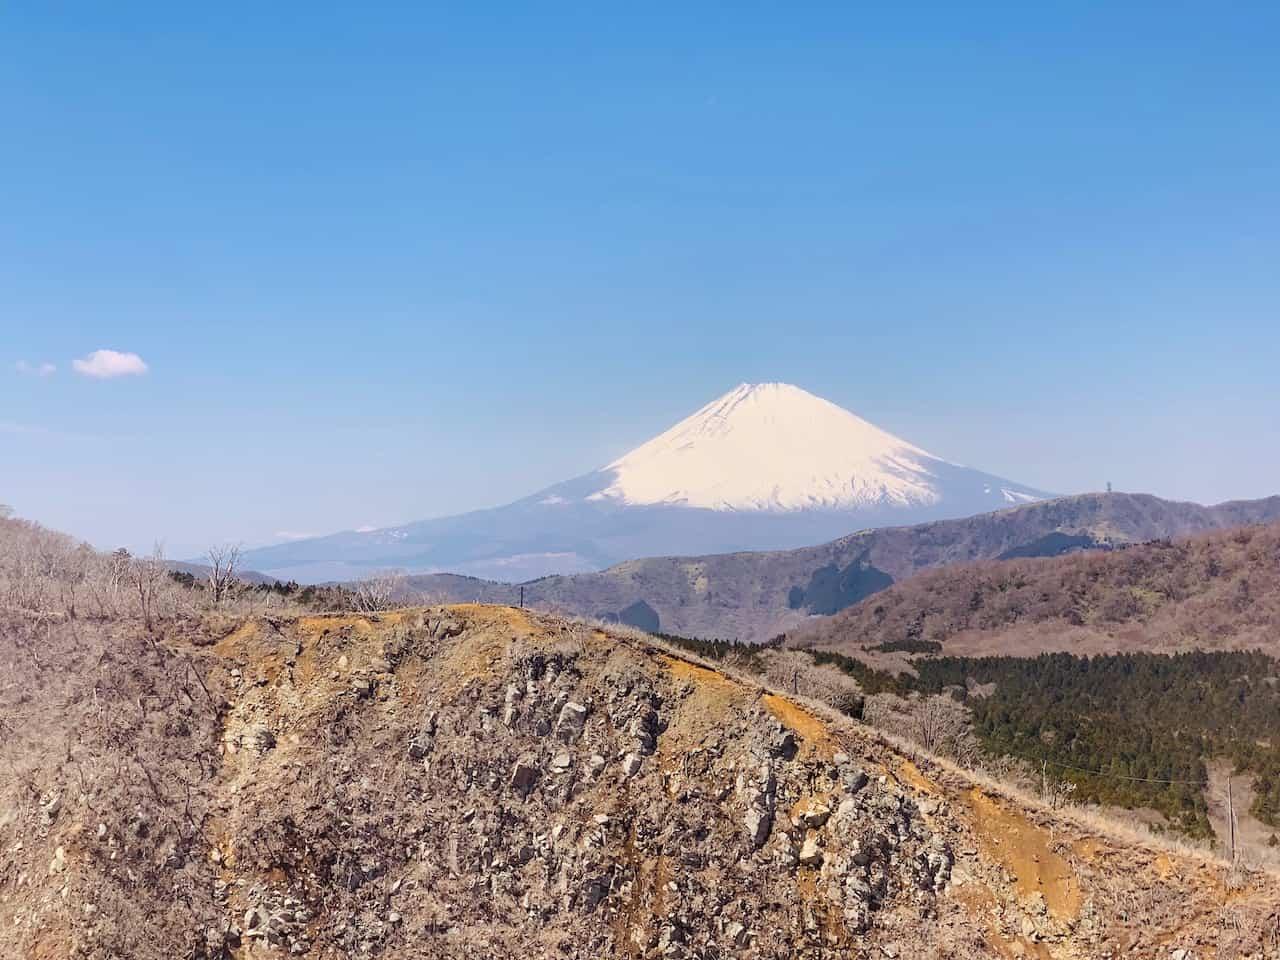 Hakone Ropeway Mount Fuji View